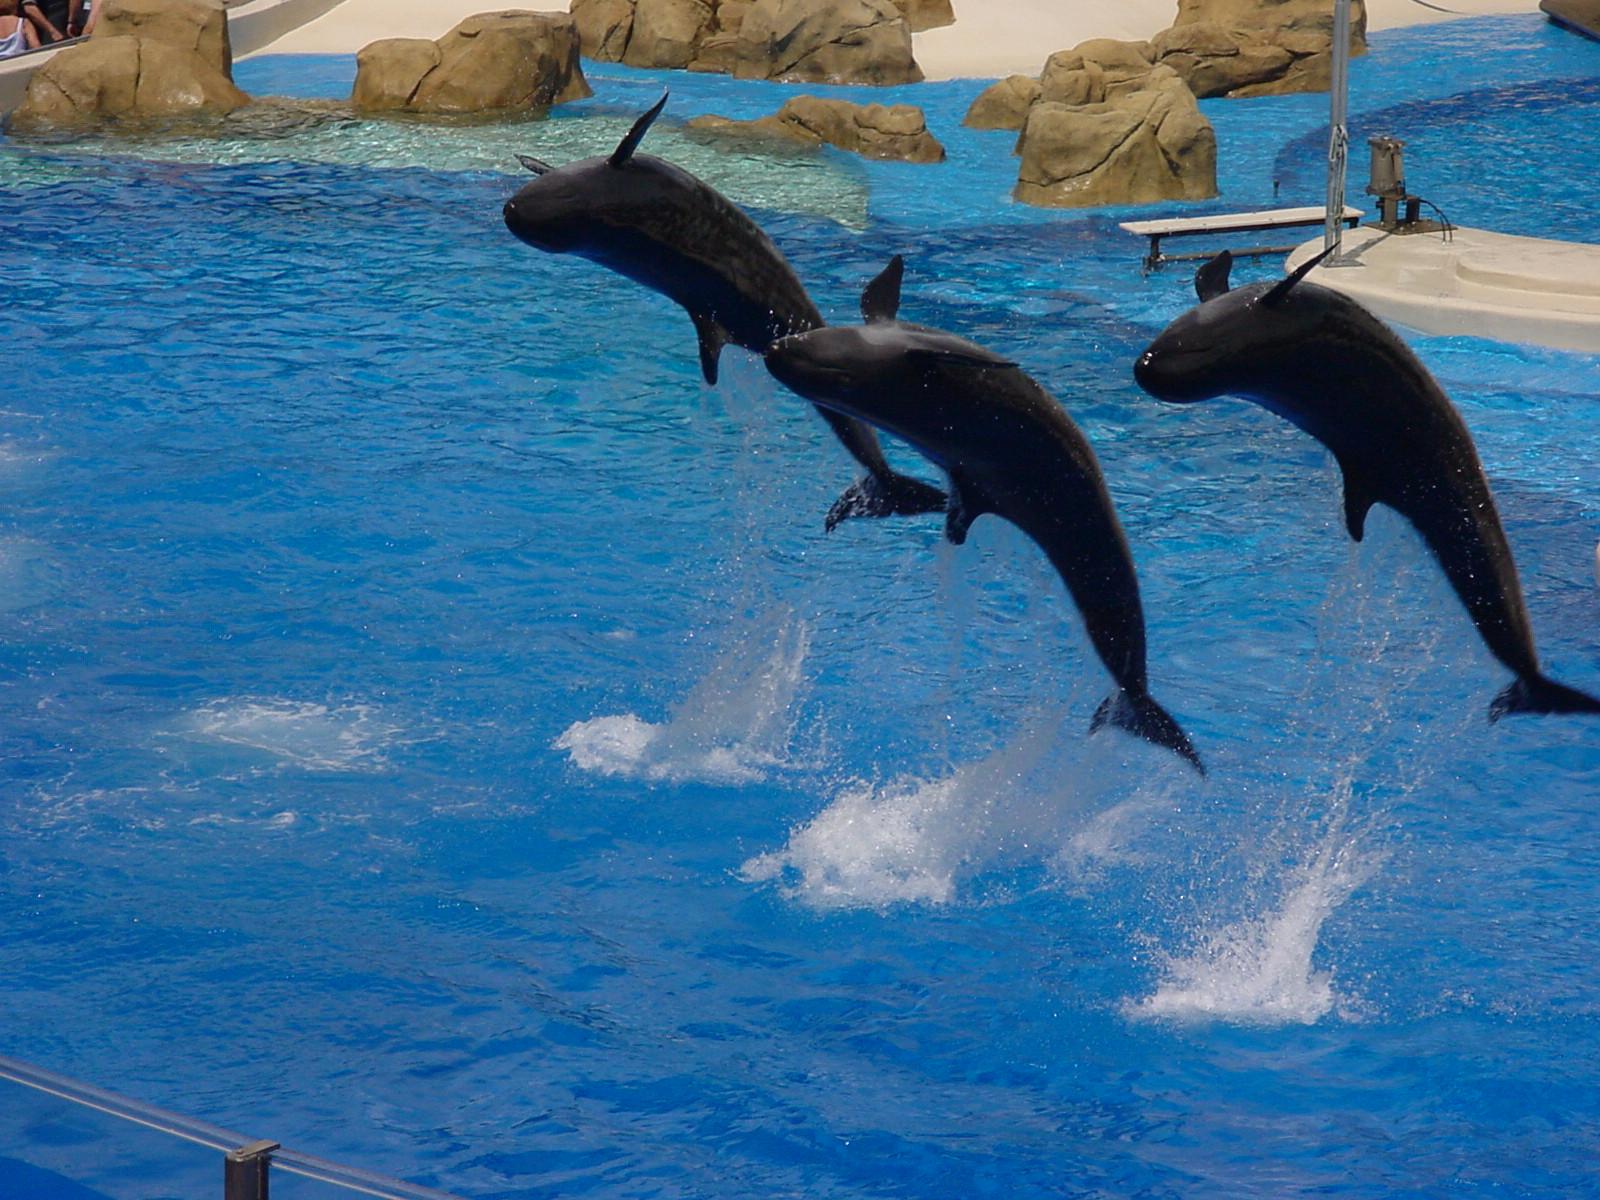 http://upload.wikimedia.org/wikipedia/commons/1/16/Orlando_Sea_World_Dolphins_2.jpg